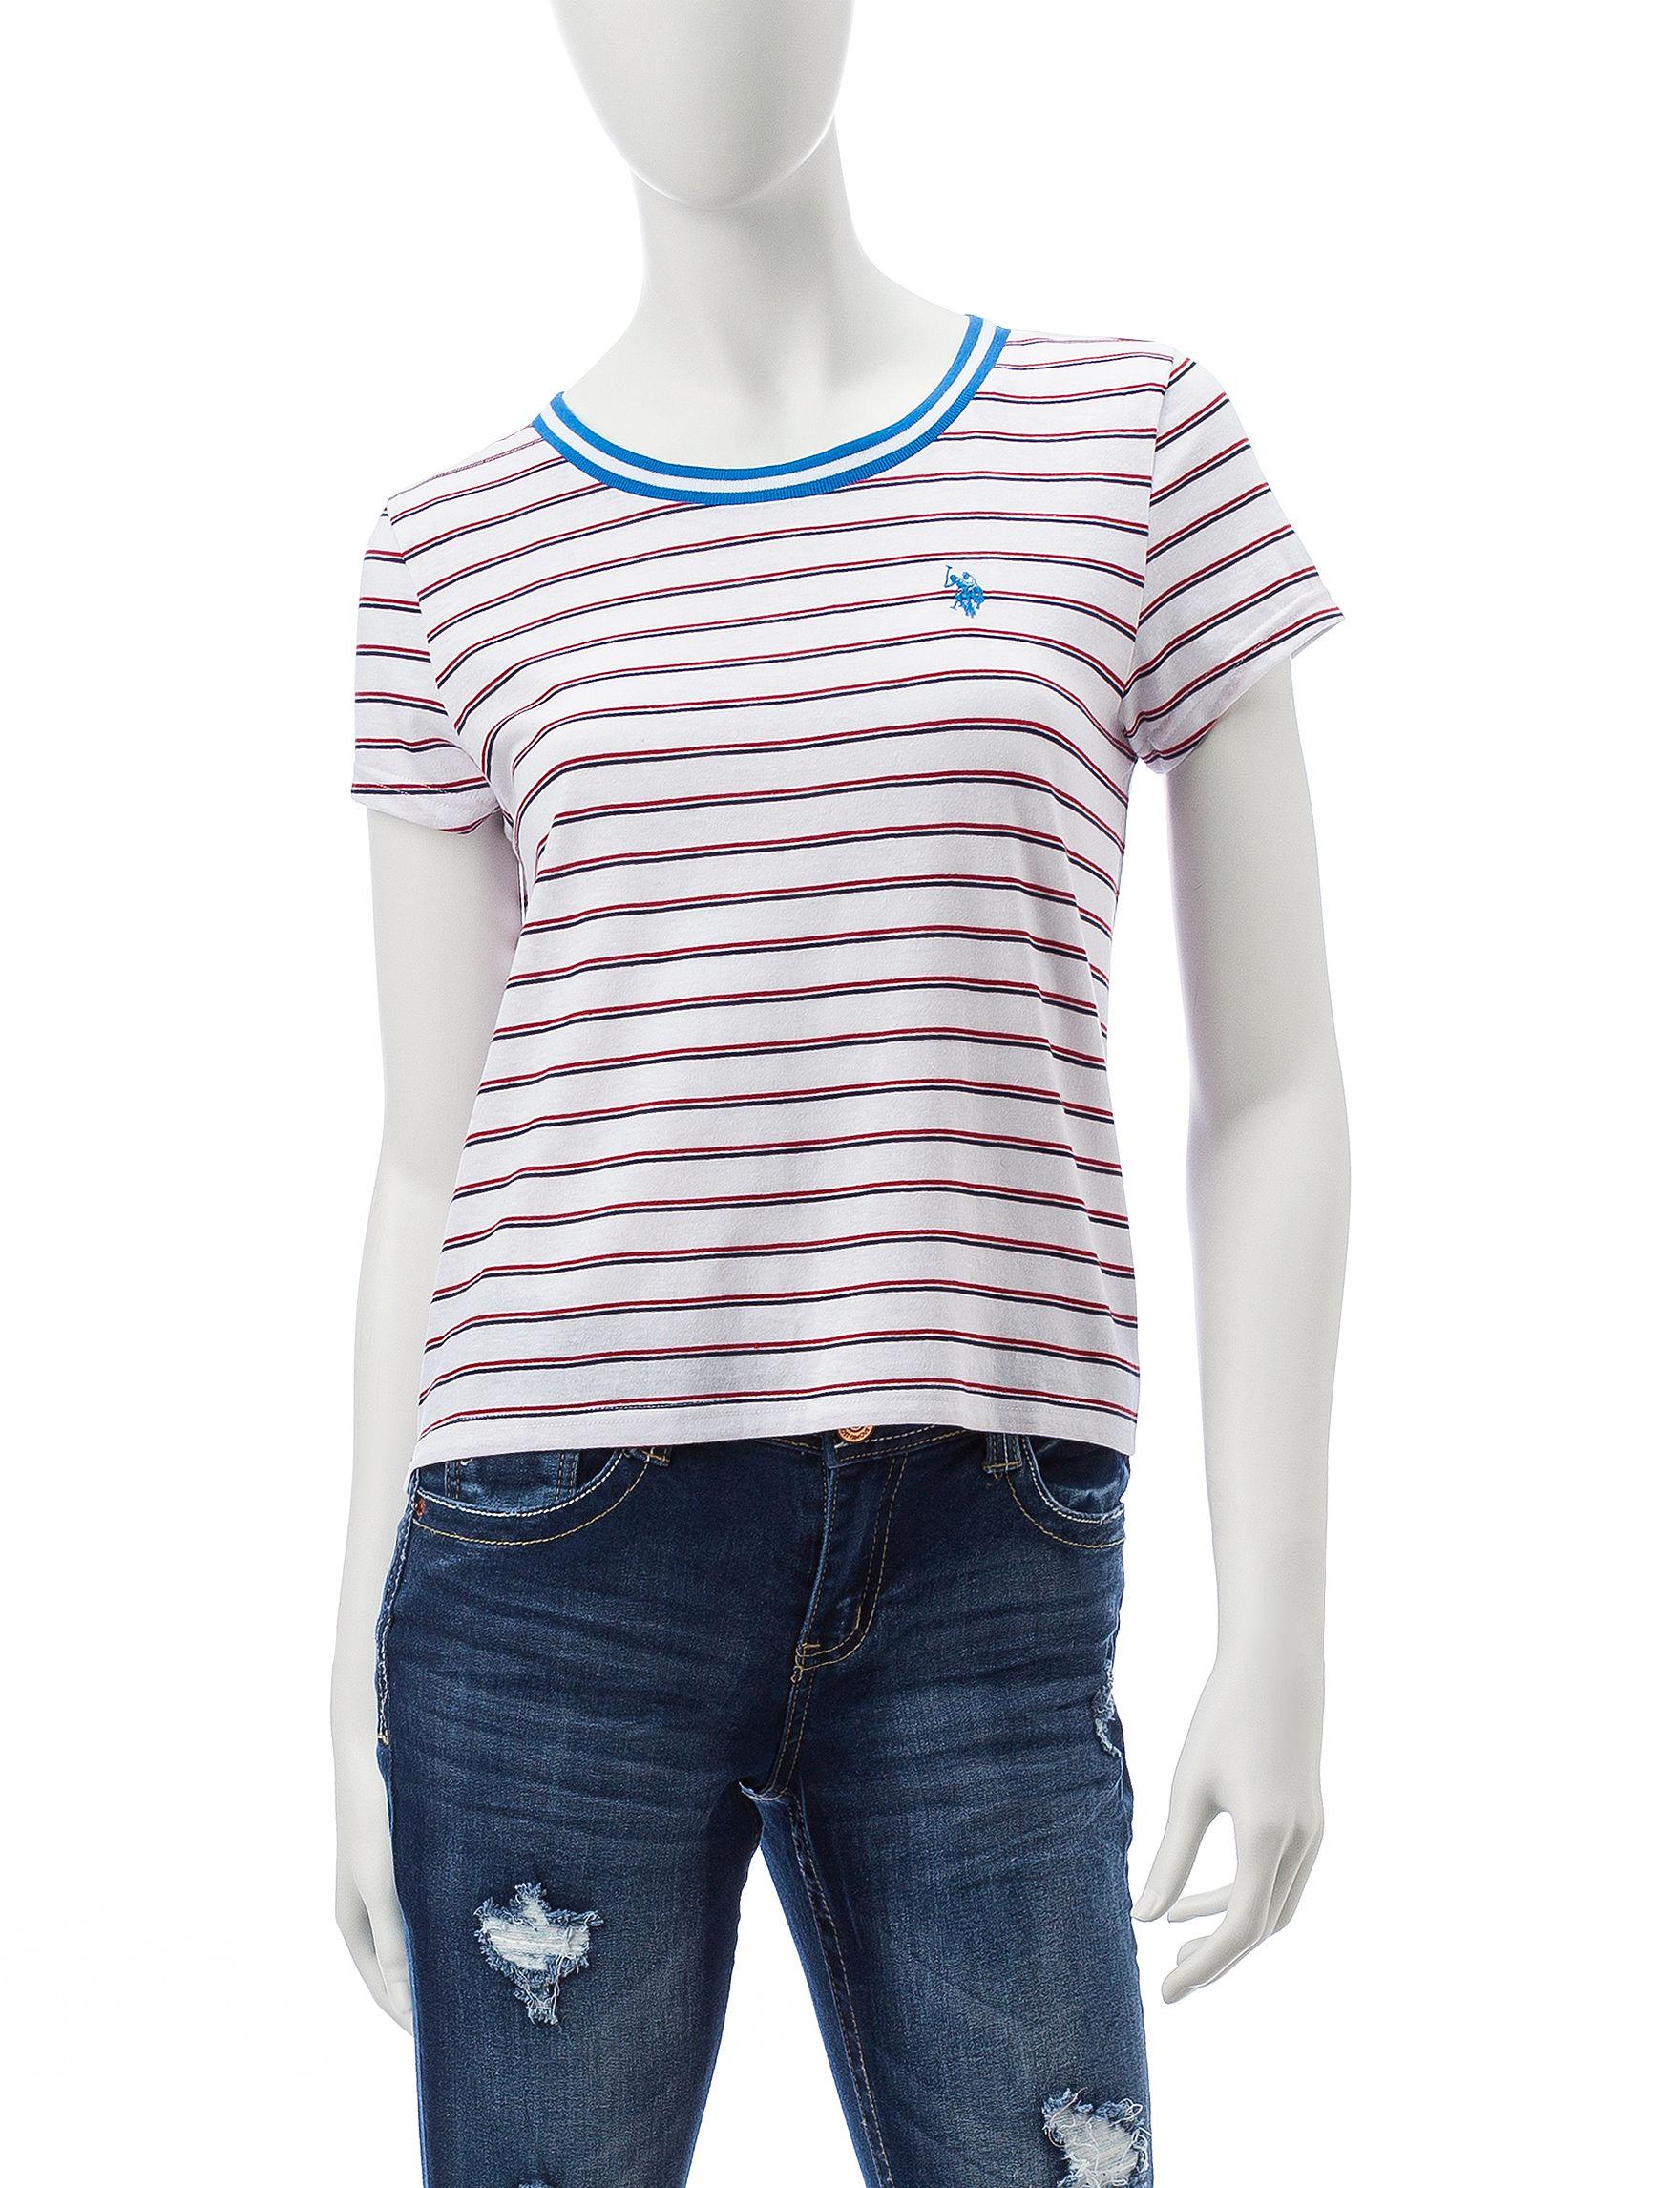 U.S. Polo Assn. White Shirts & Blouses Tees & Tanks